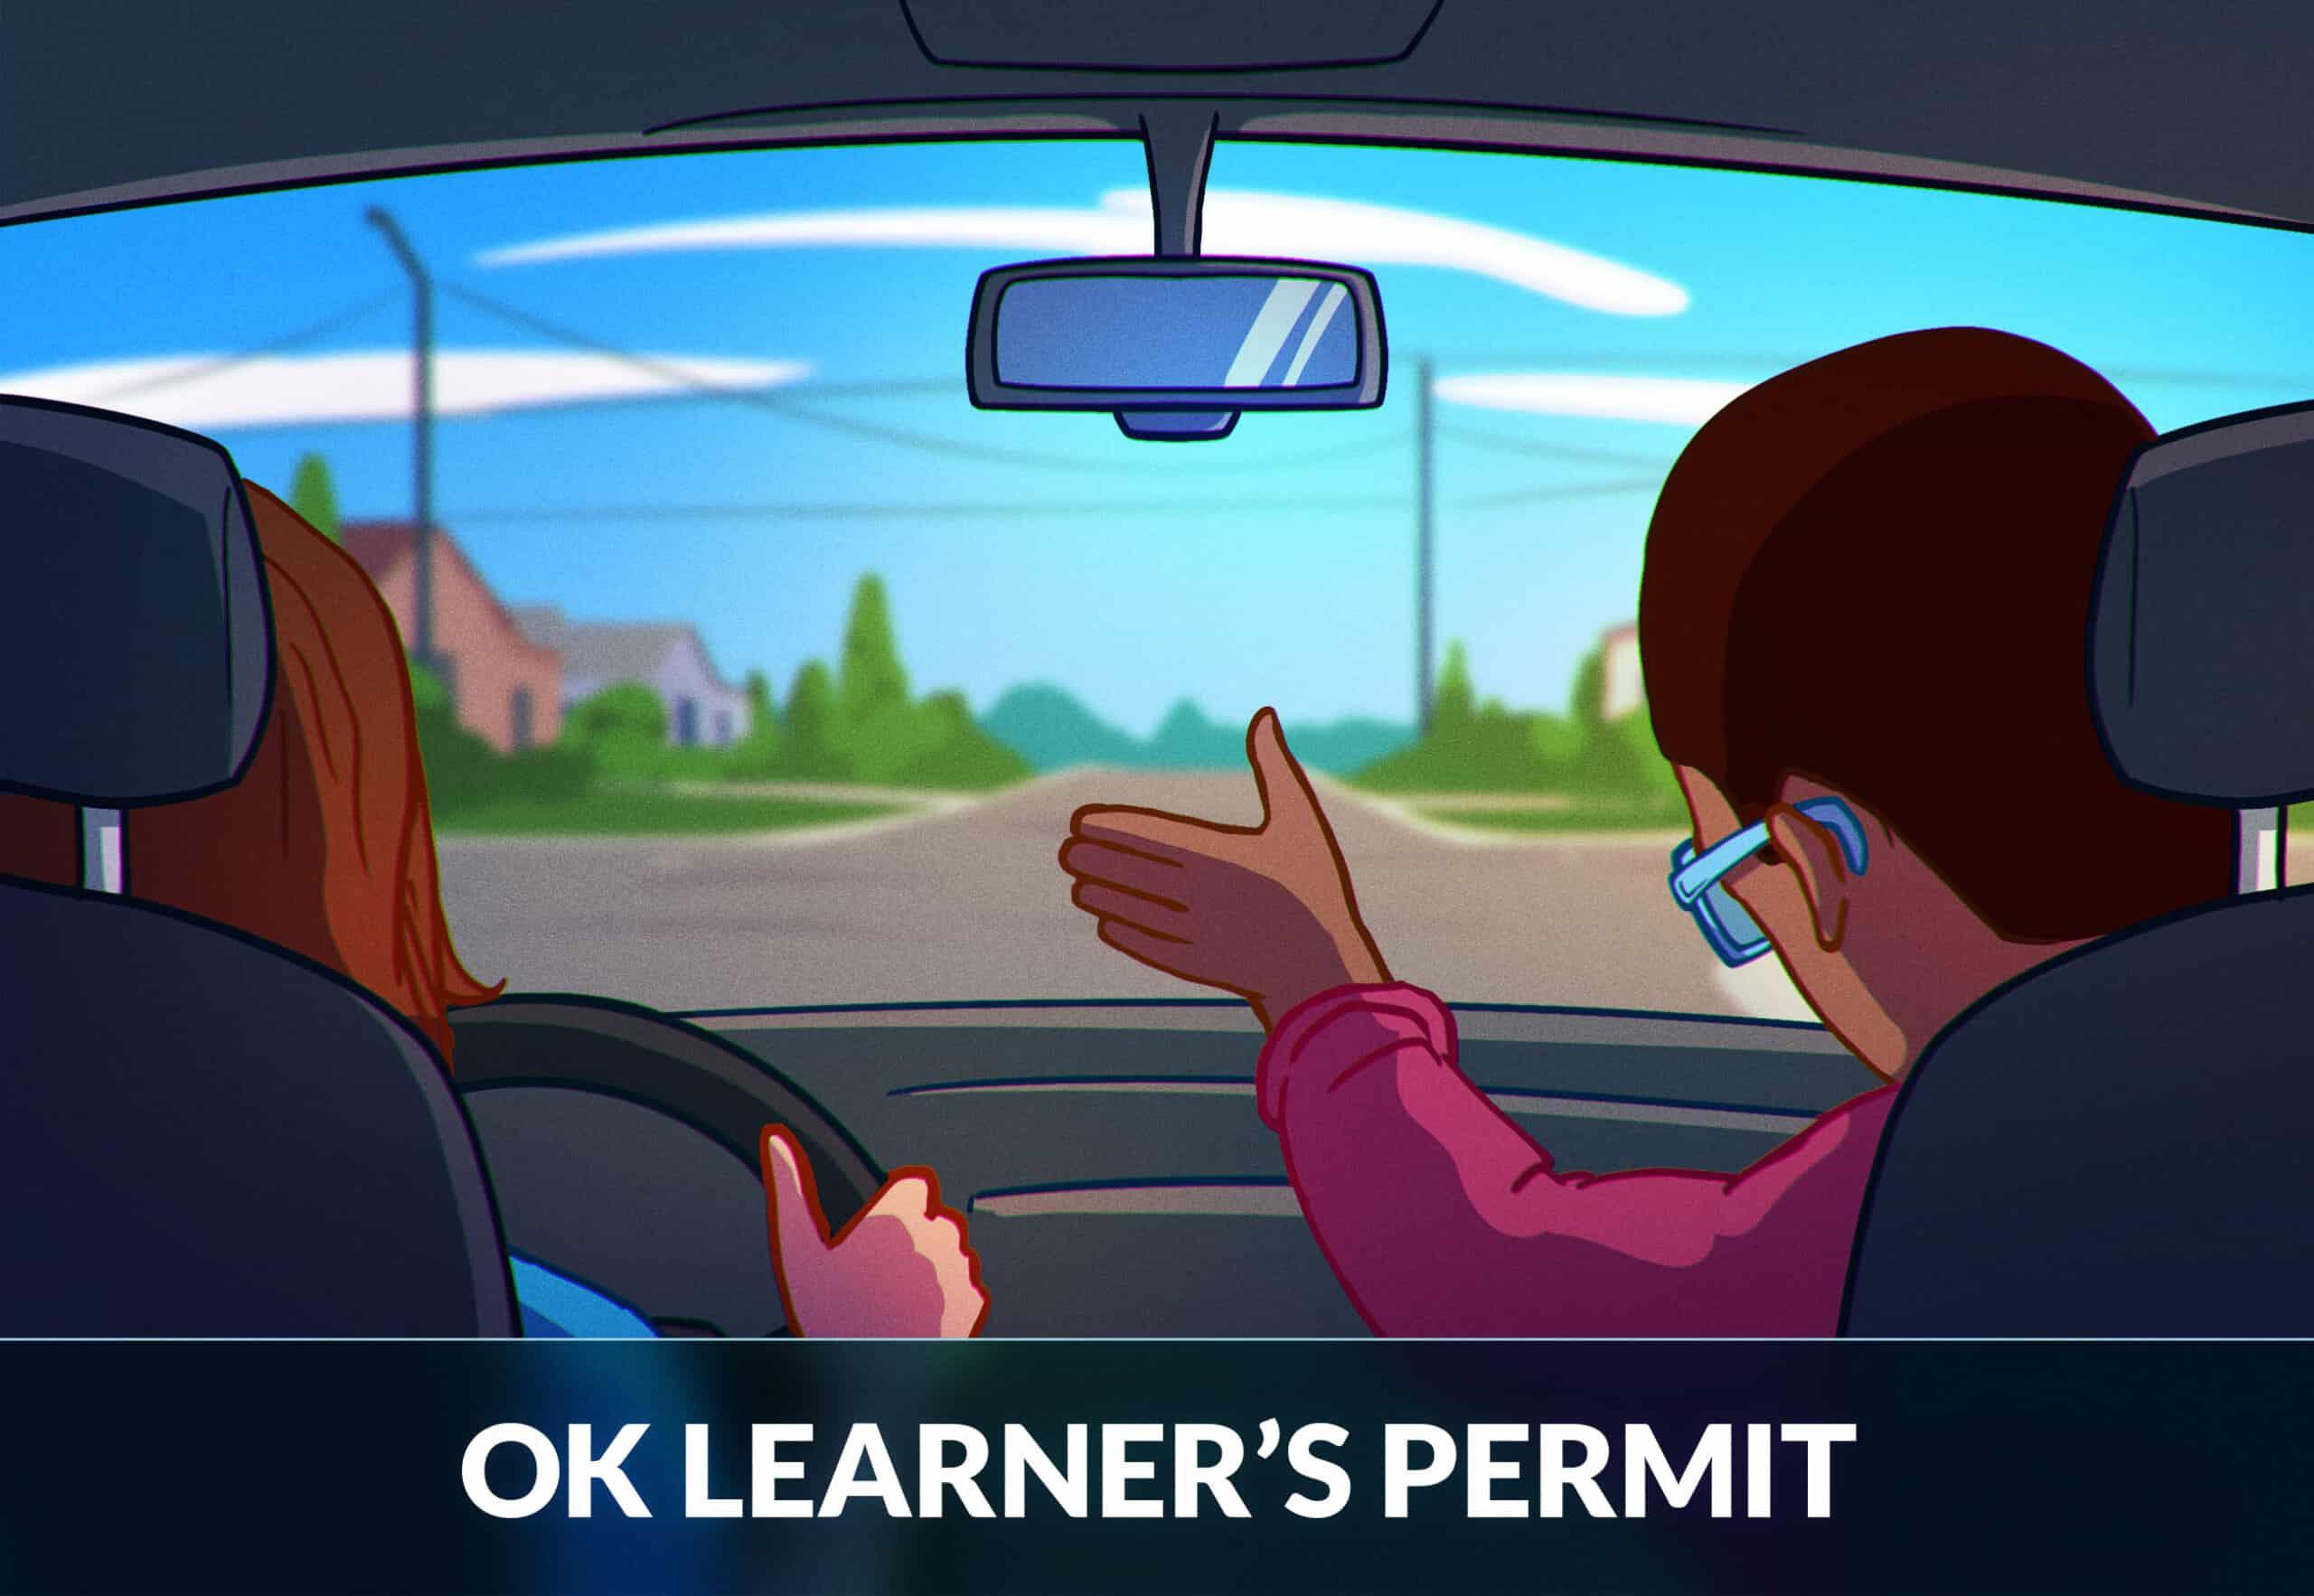 Oklahoma Learner's Permit